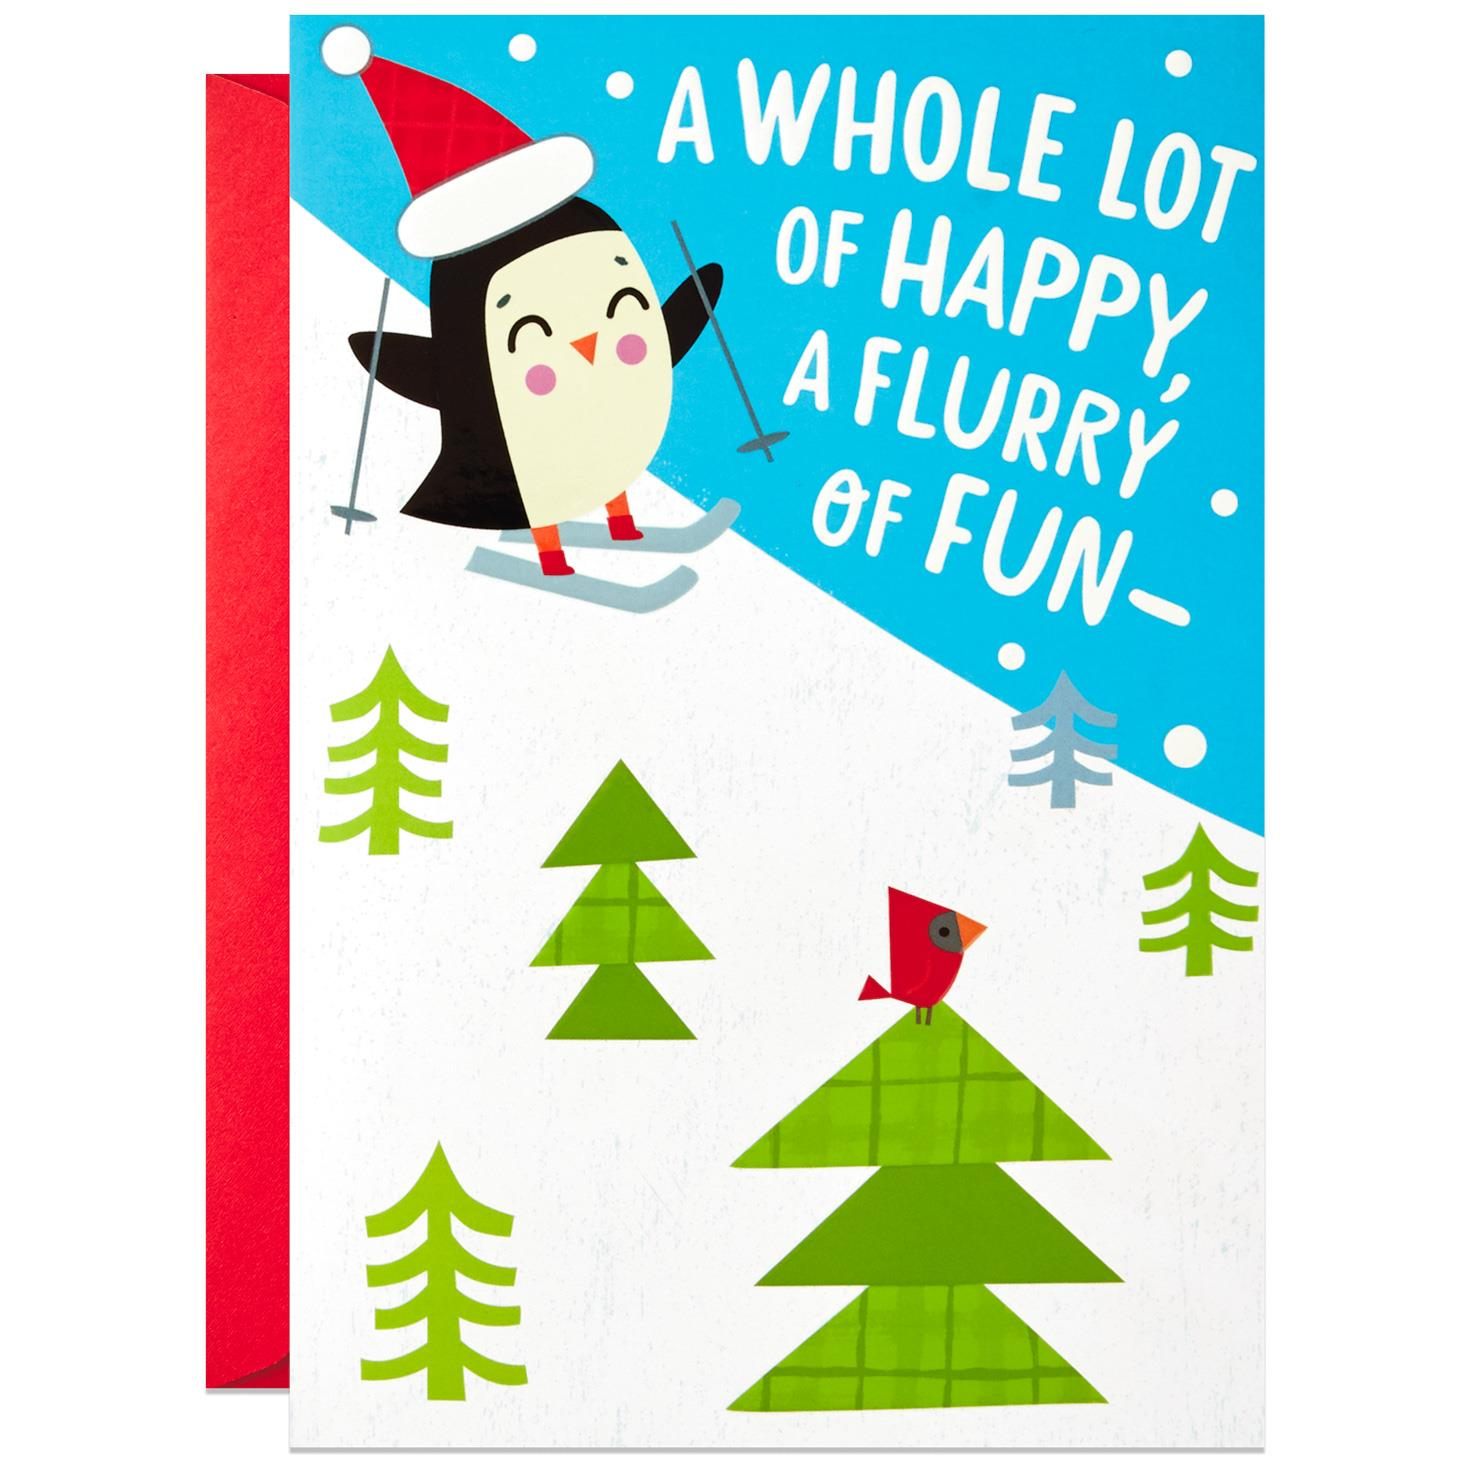 Flurry of Fun Christmas Card Greeting Cards Hallmark